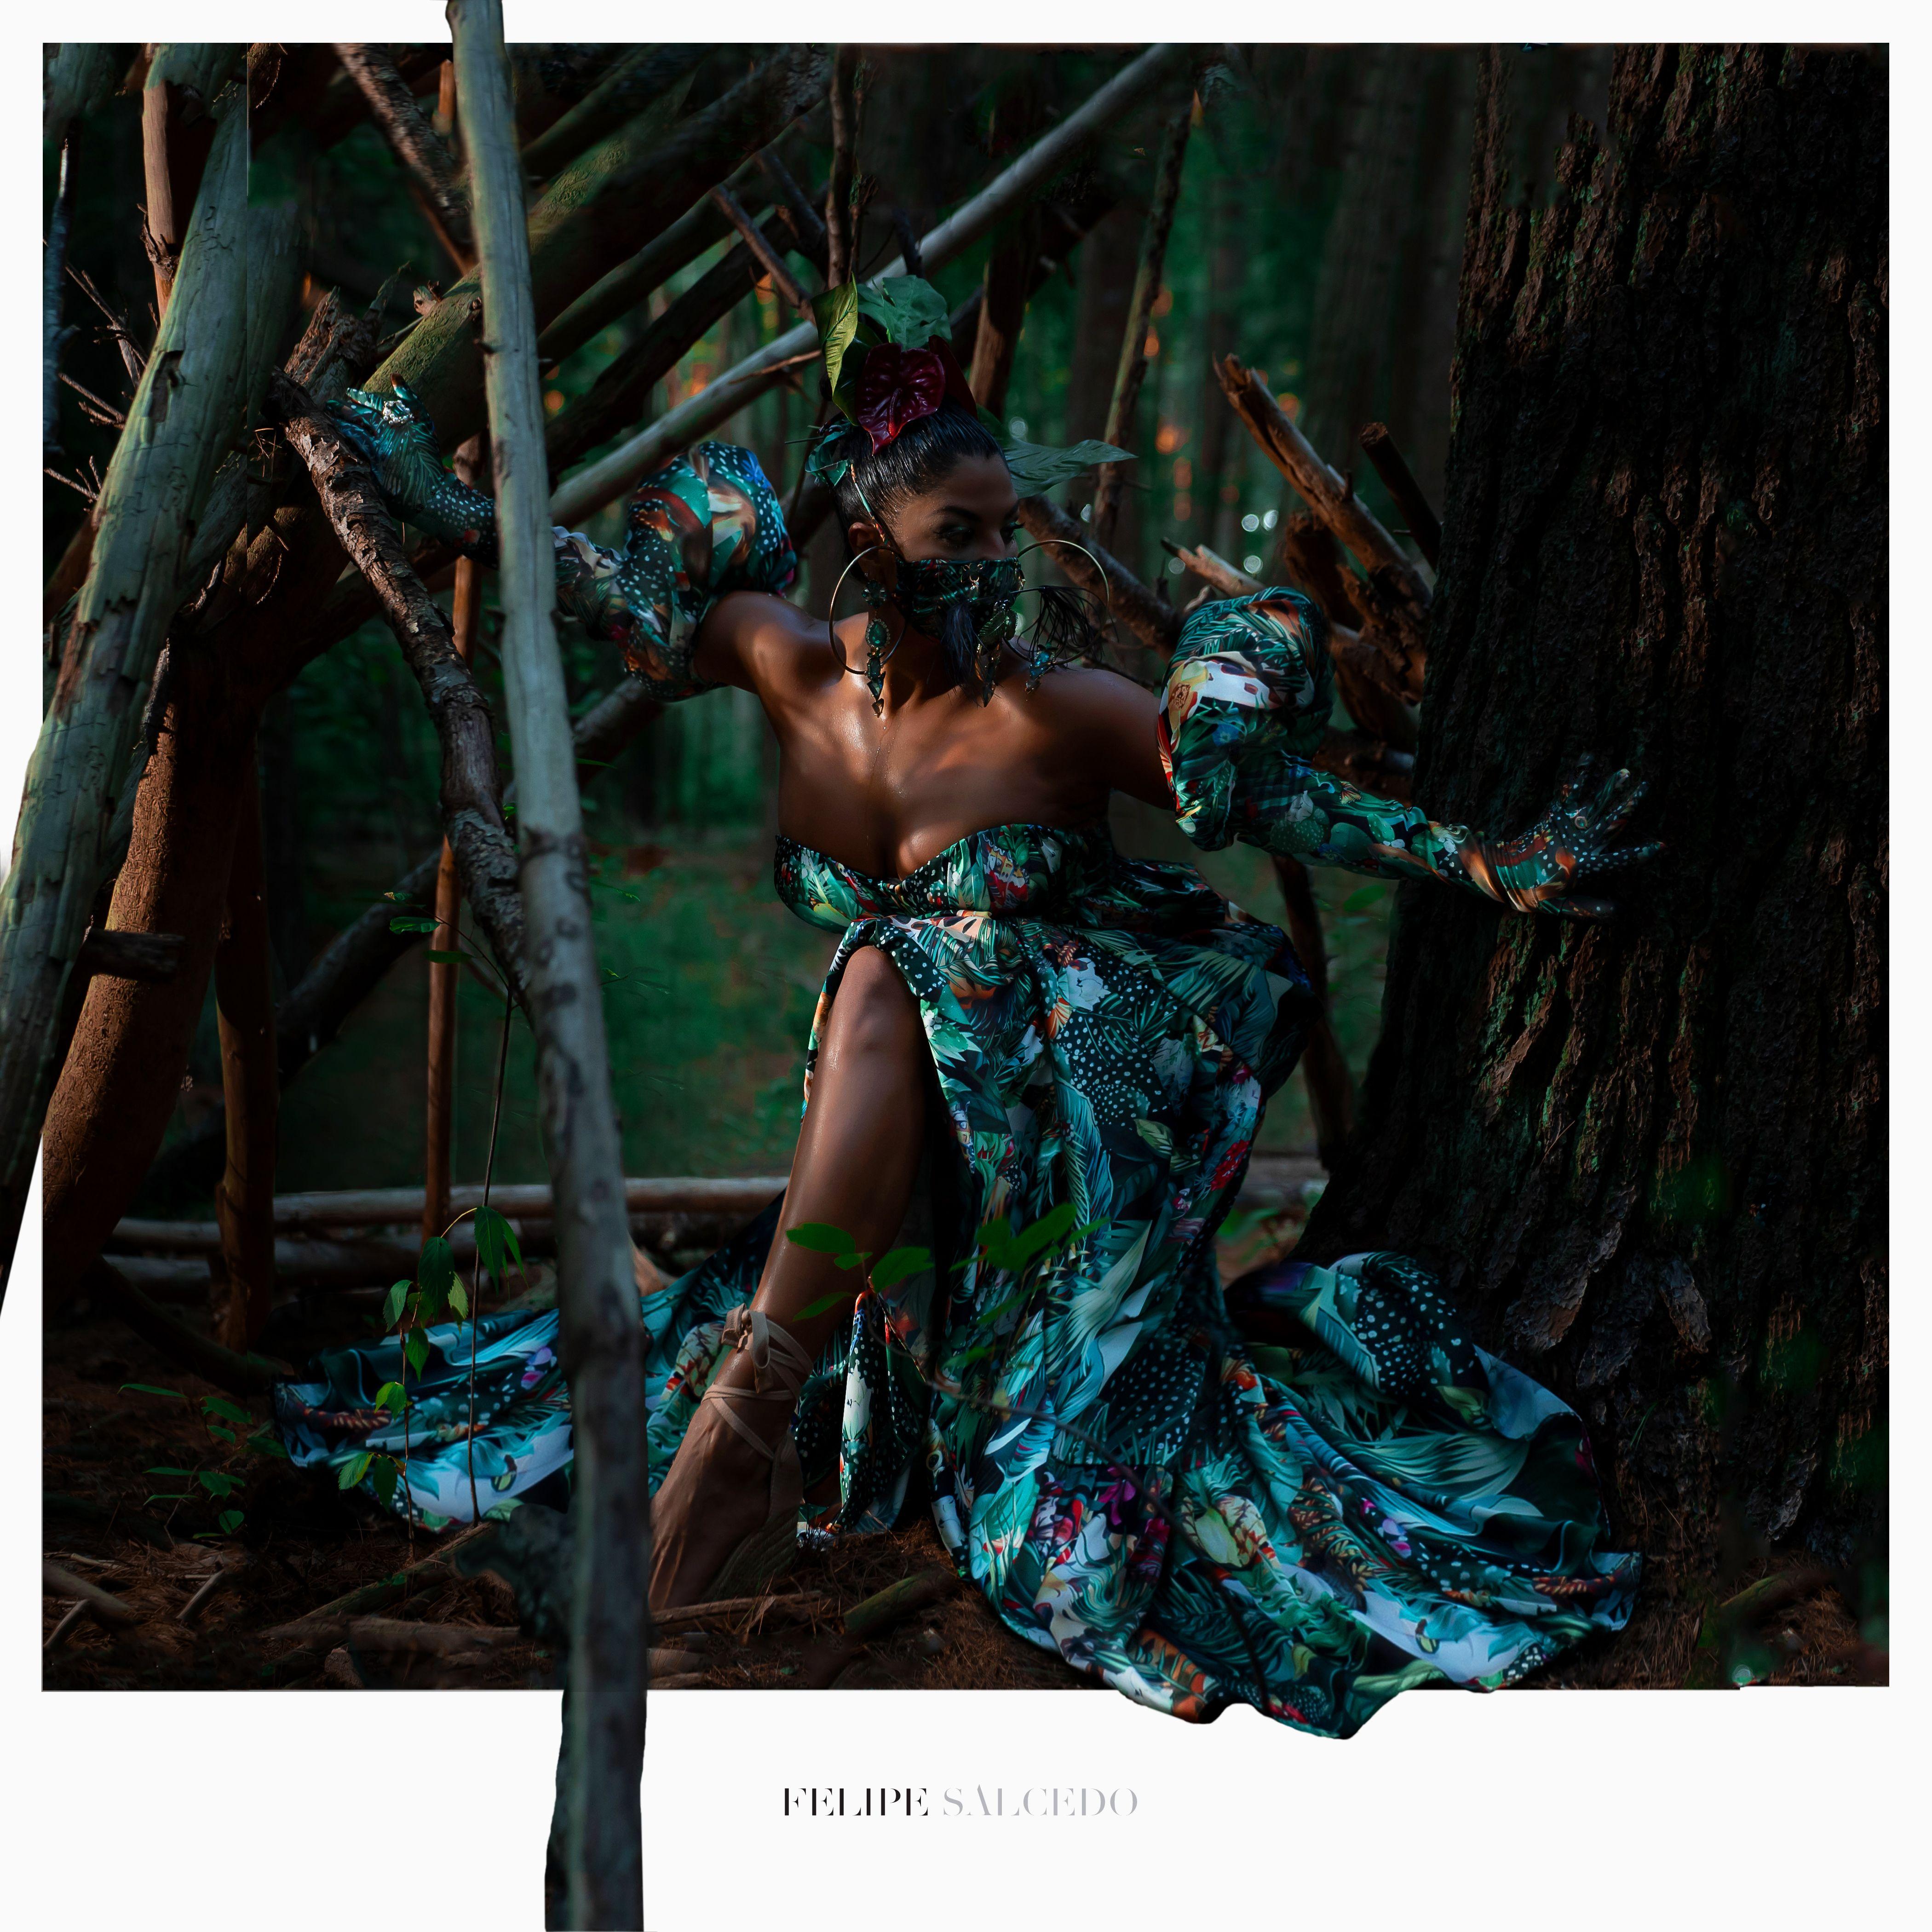 Step into my Rapa Nui Fantasy #rapanui #maskcouture #fashionfacemask #felipesalcedo #tropical #septumpiercing #beetle #insect #hoopearrings #fashionfacemask #couturefacemask #maskcouture #maxidress #tropicaldress #operagloves #facemask